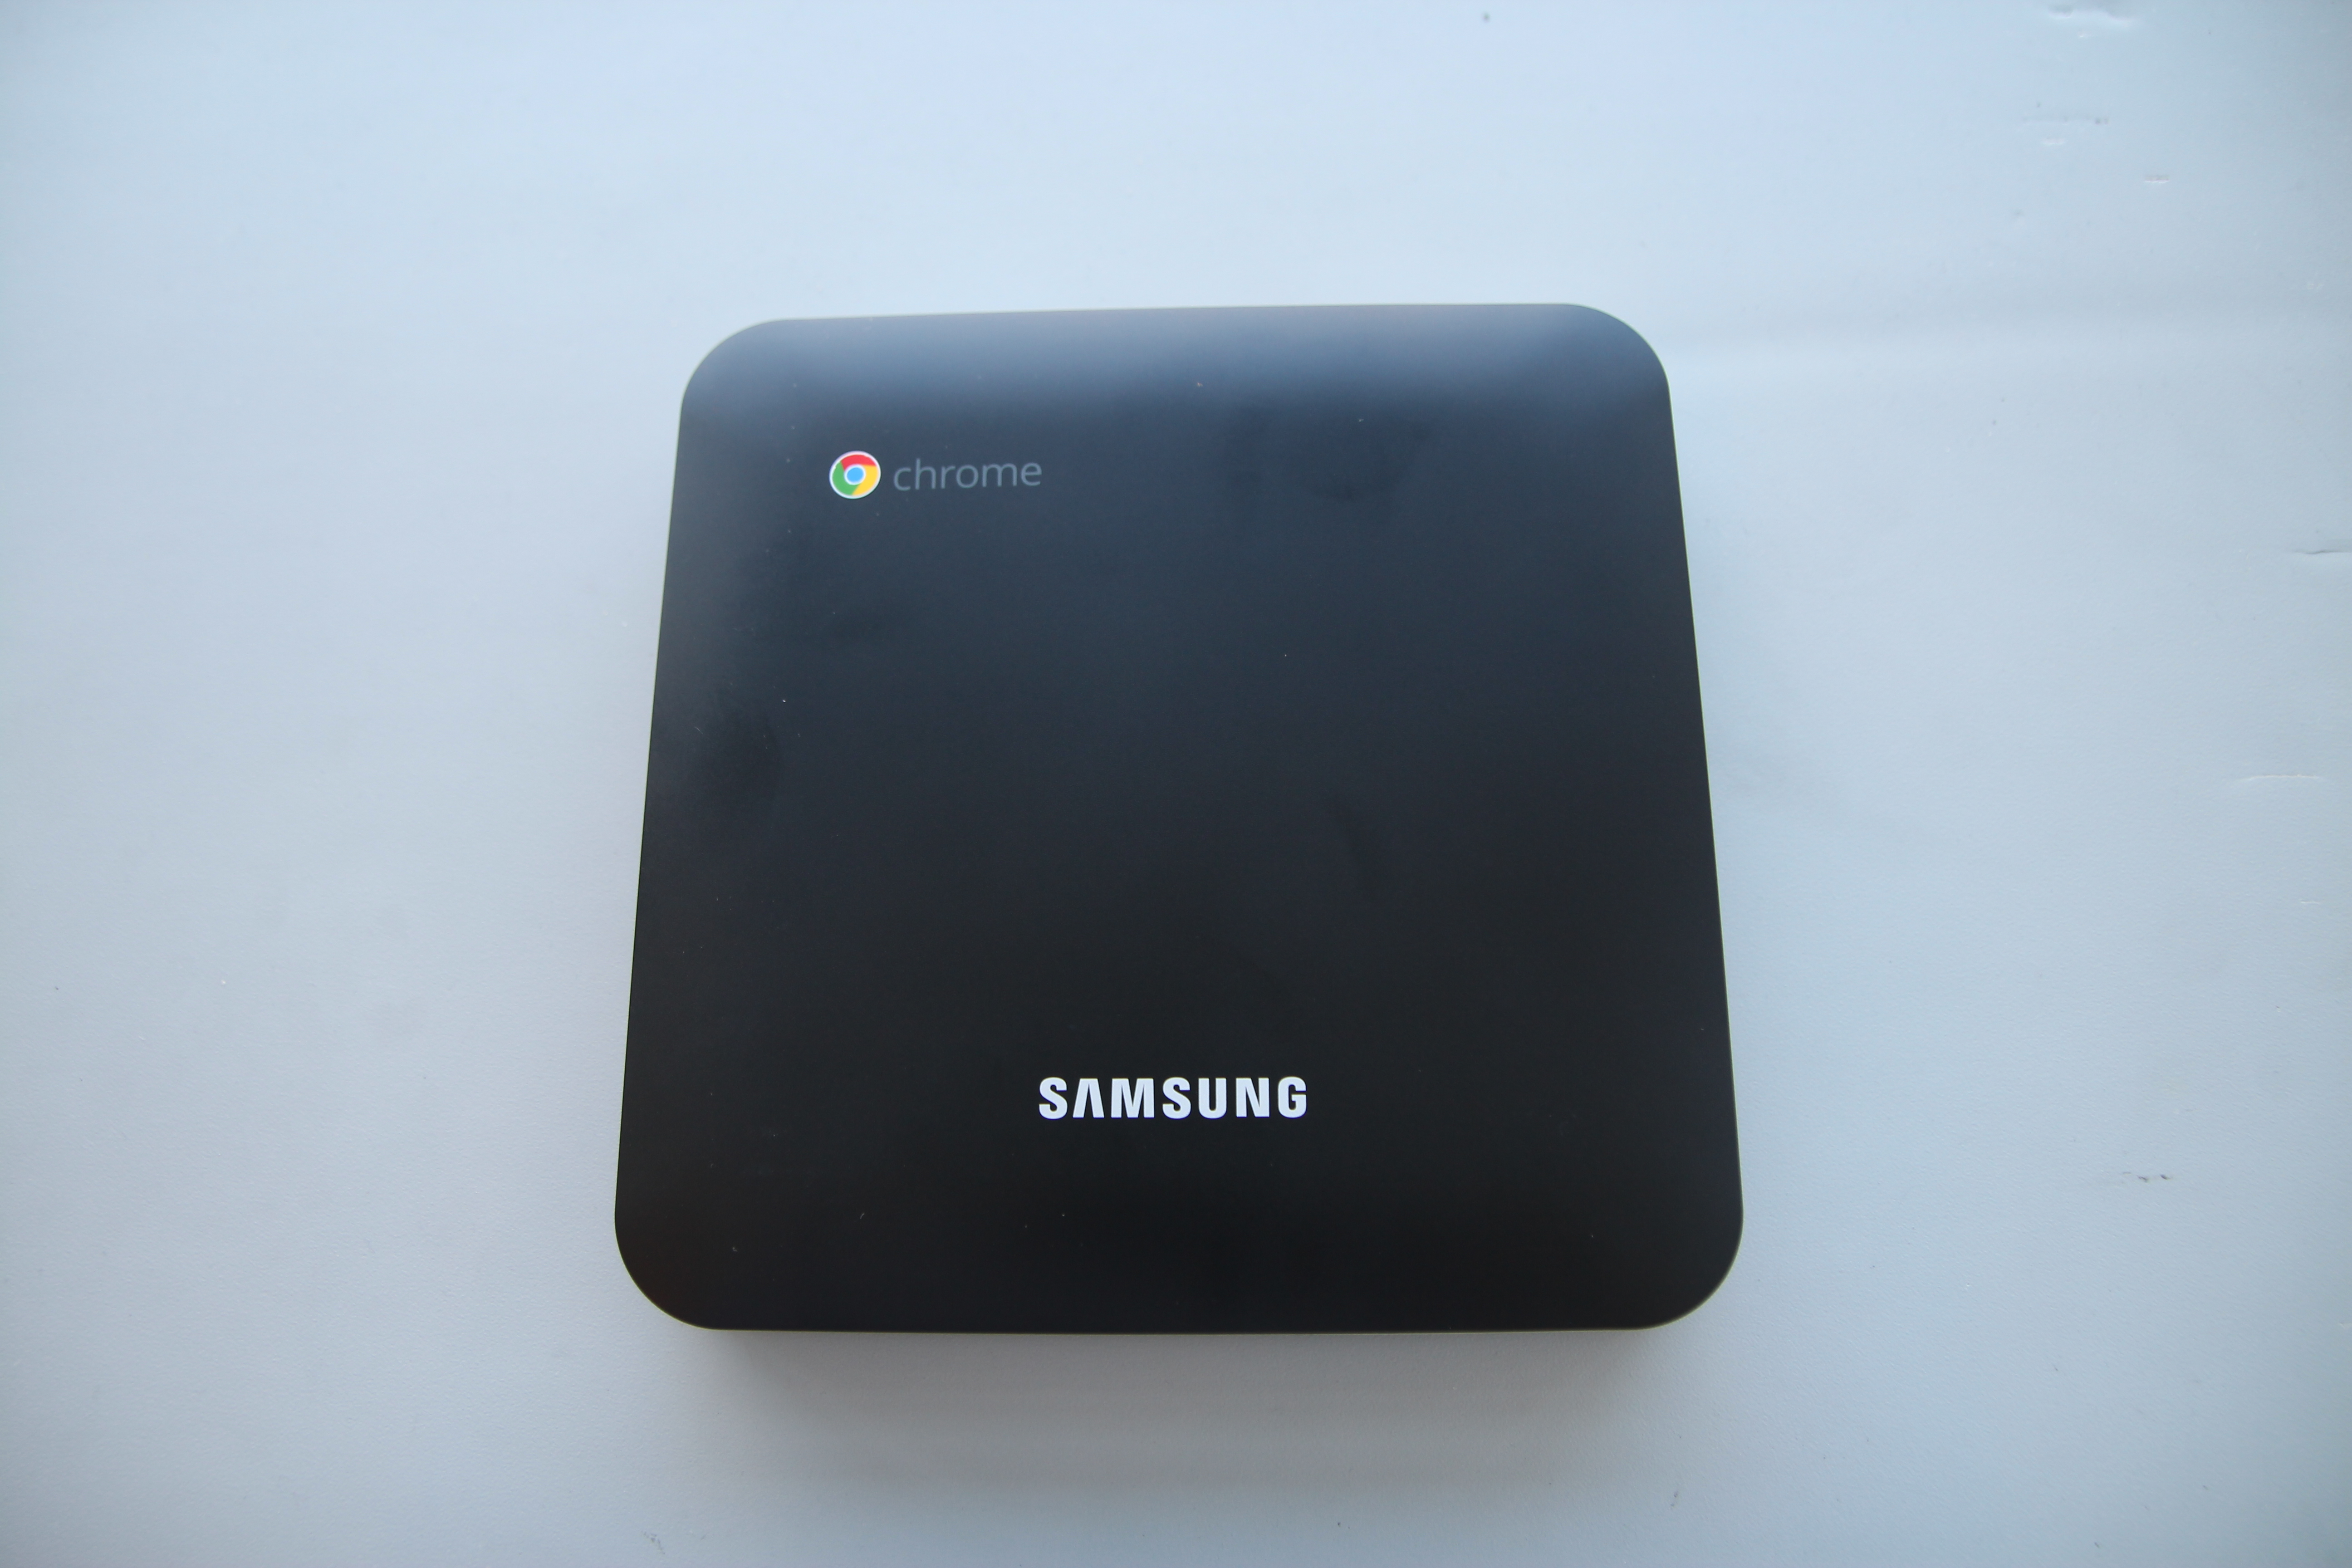 Amazon.com: Samsung Series 3 Chromebox: Computers & Accessories